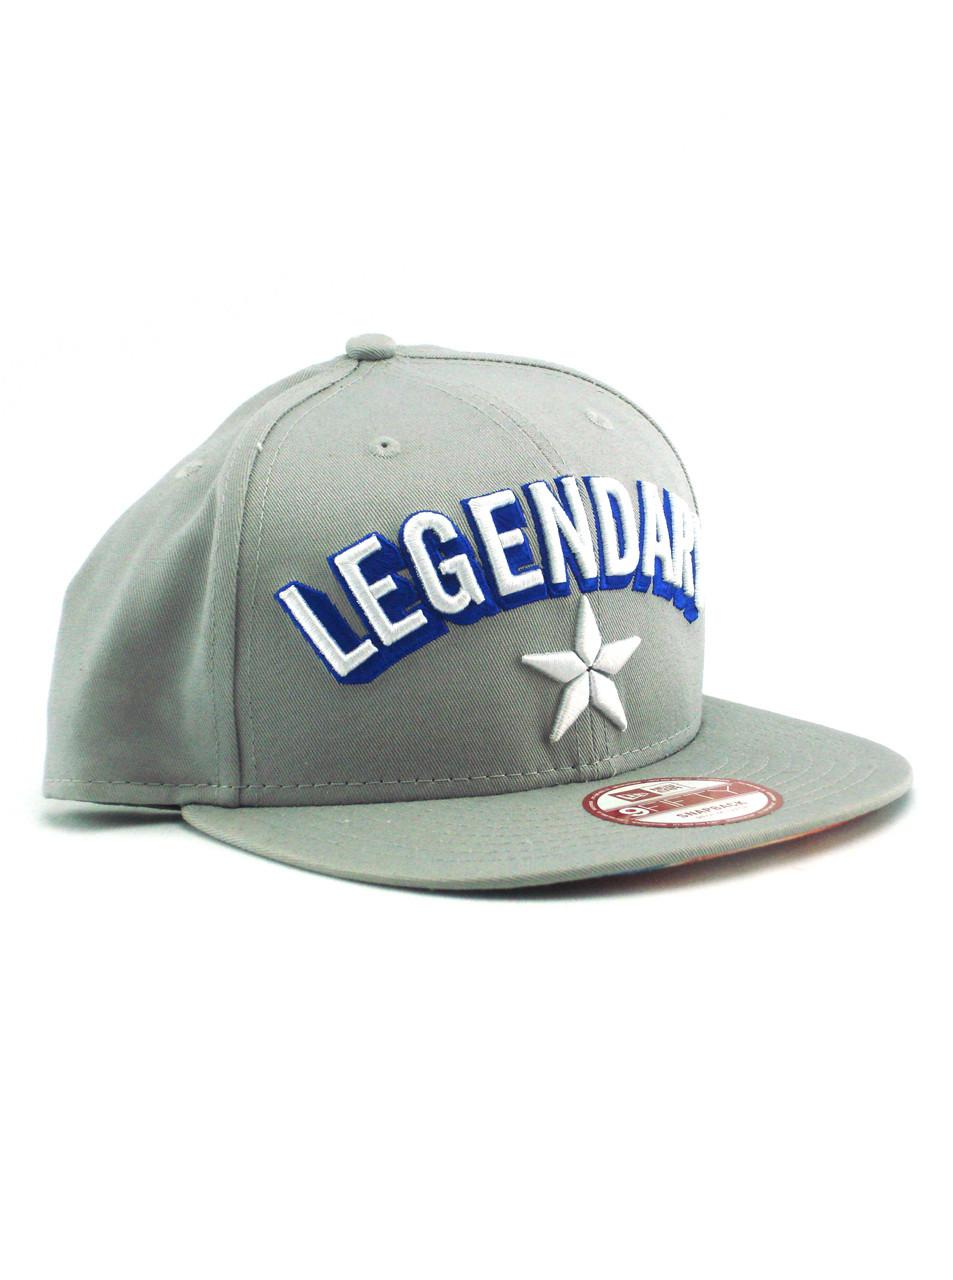 a5afc367cb8 New Era Legendary Captain America 9fifty Snapback Hat Grey View 1